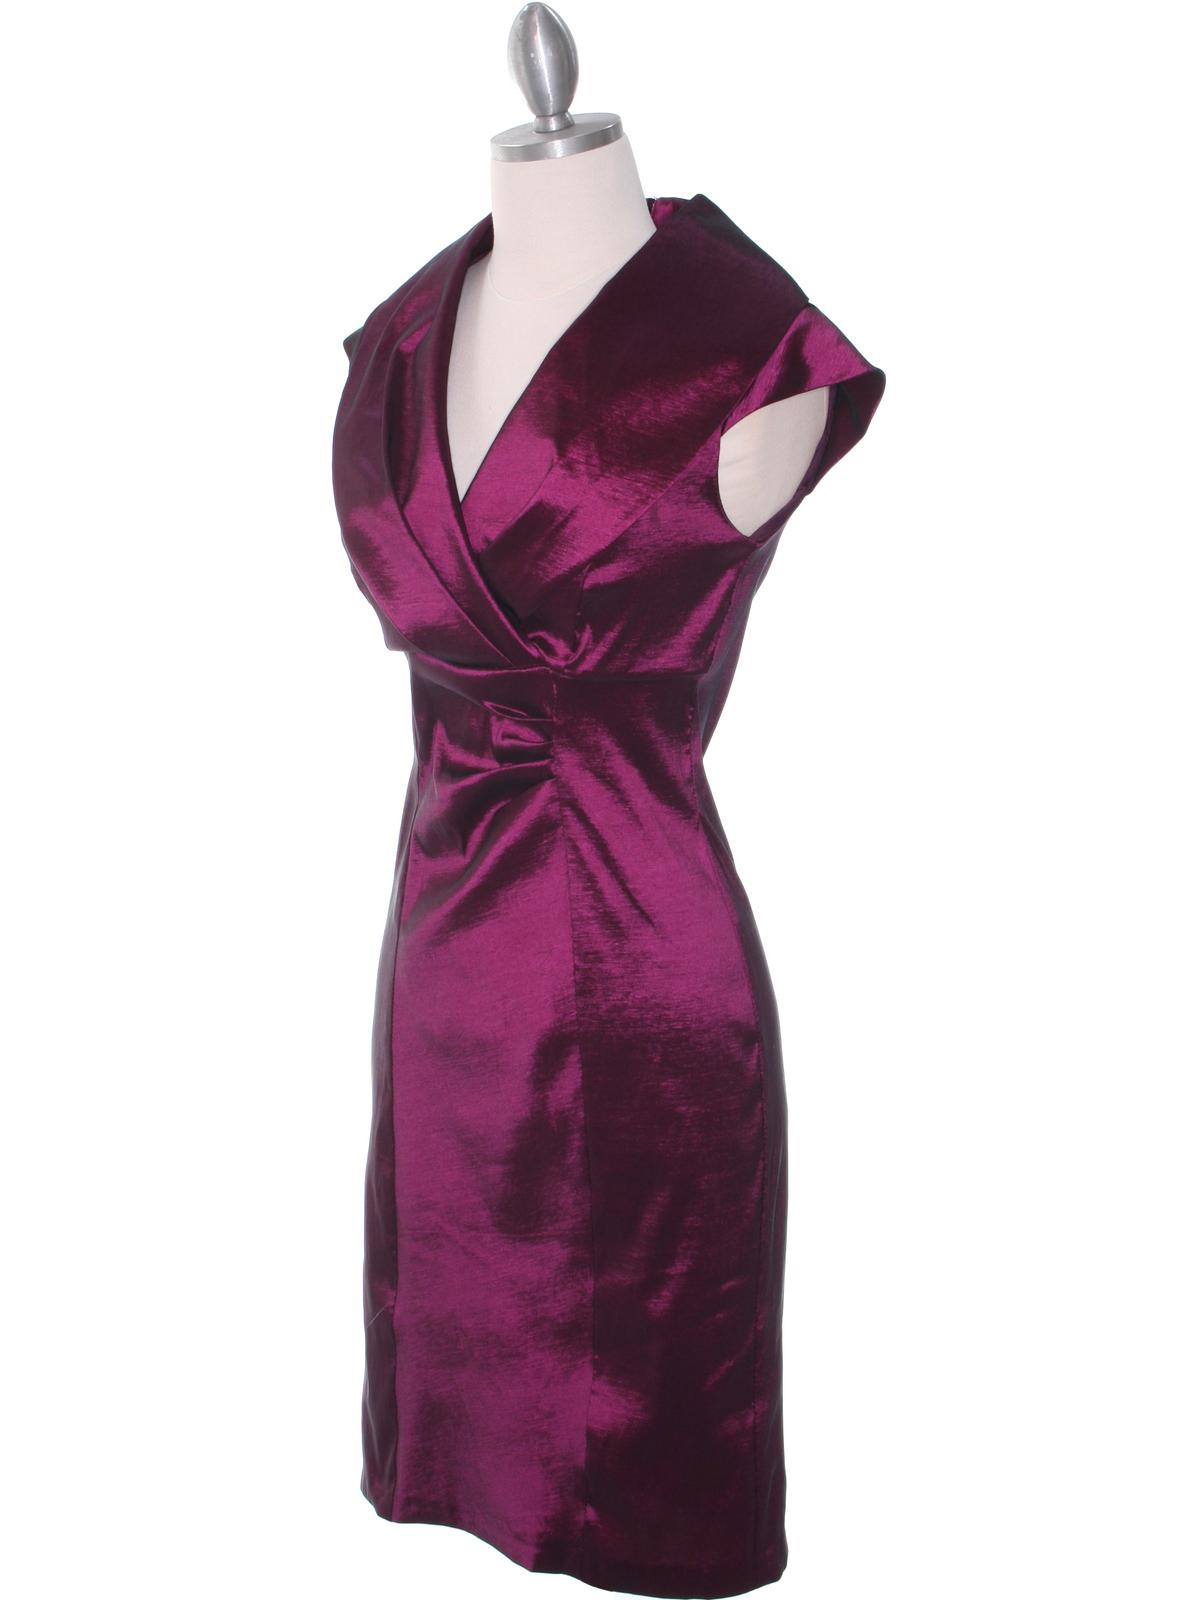 Bolero Jacket For Evening Dress